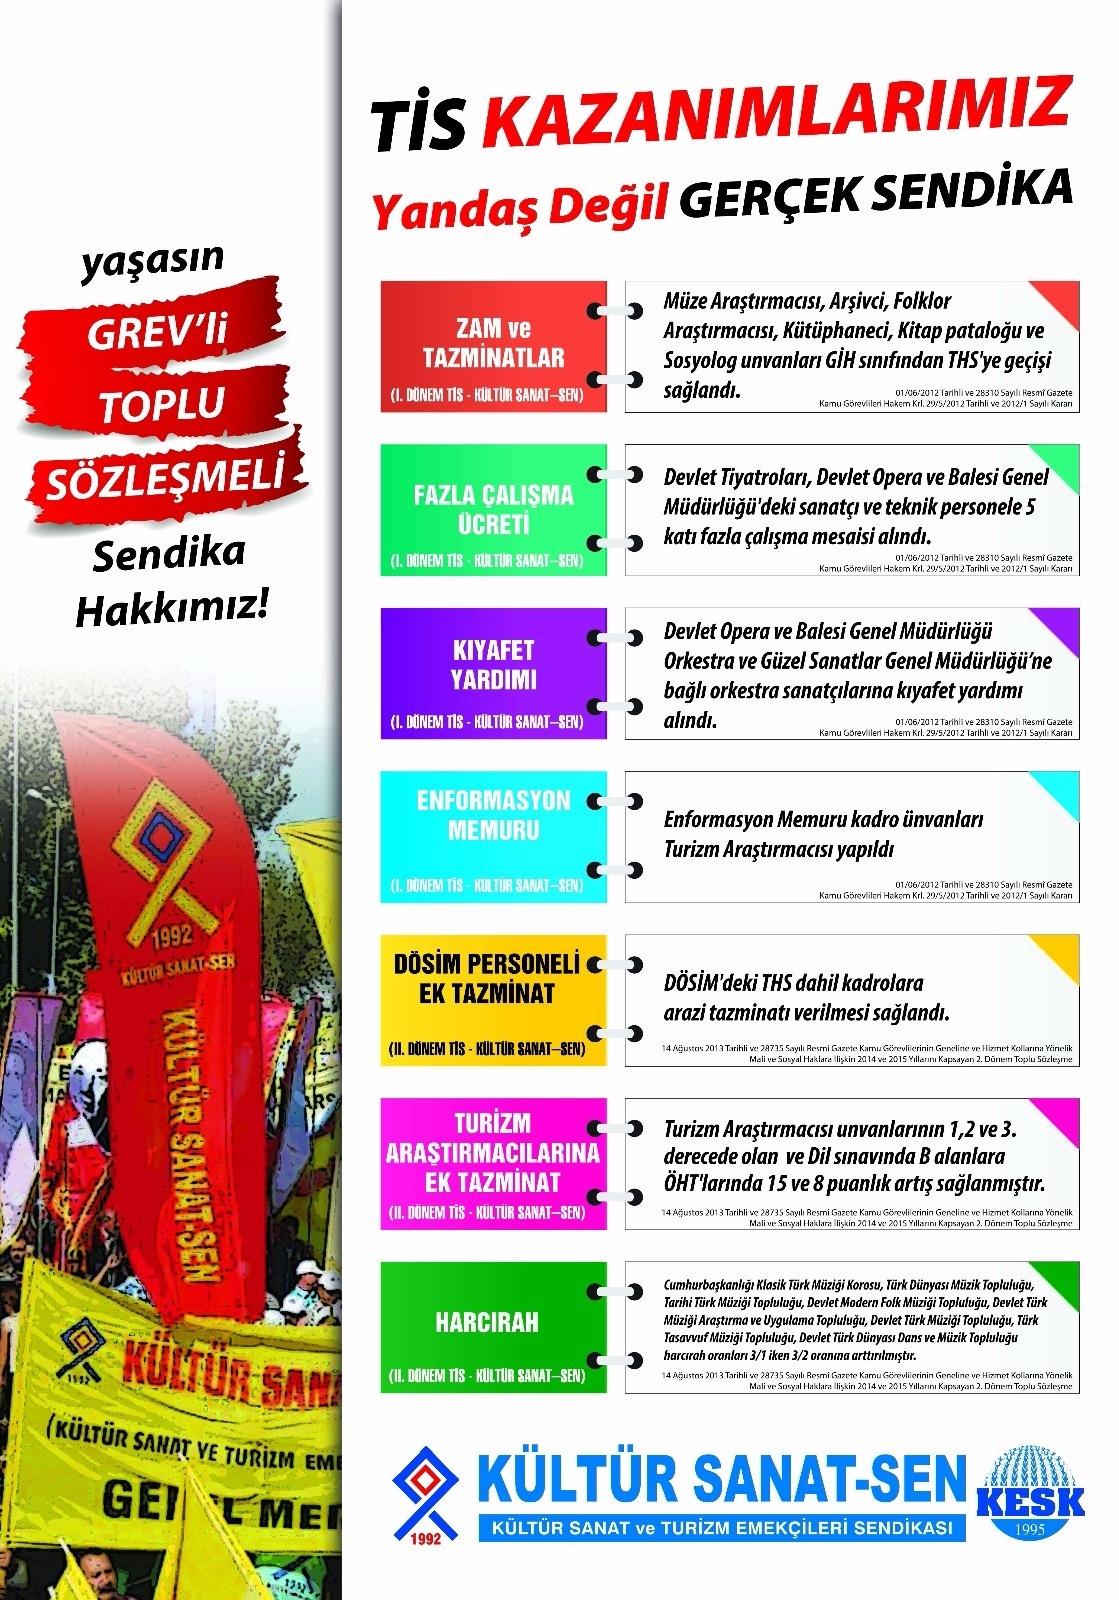 TİS KAZANIMLARIMIZ